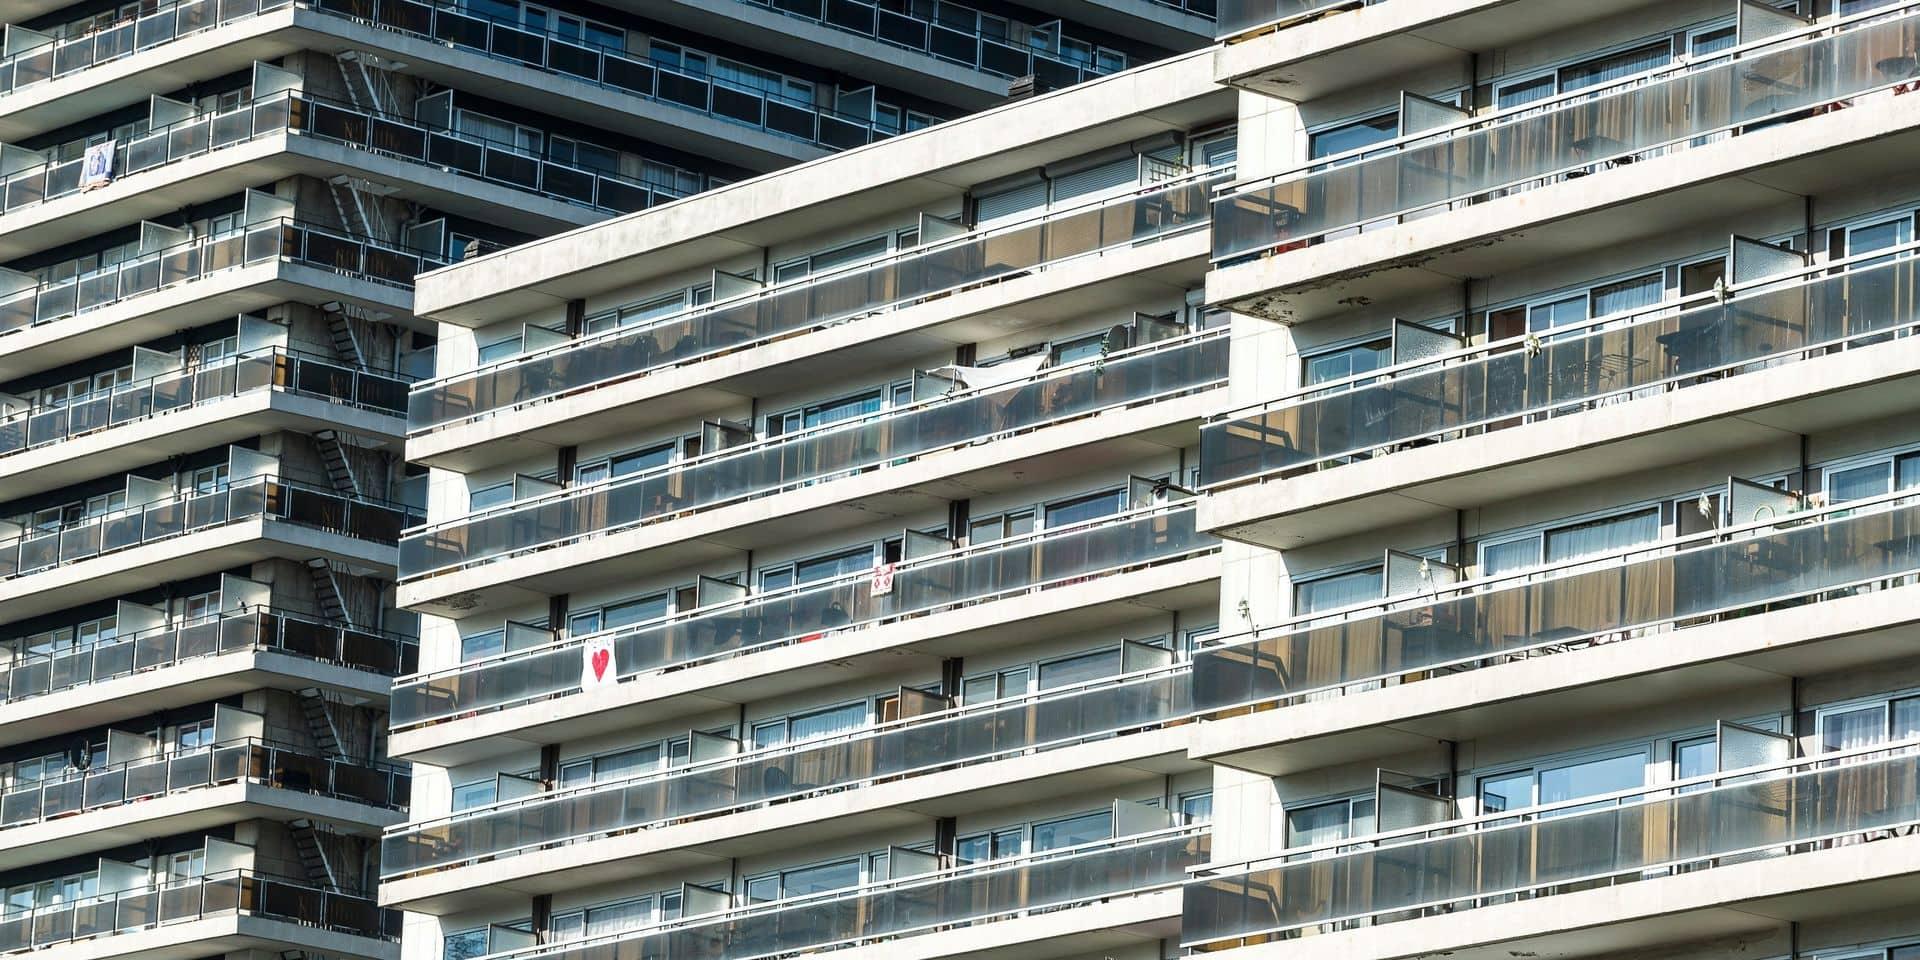 Rénovation des logements publics: la Wallonie va investir 1,2 milliard en 4 ans